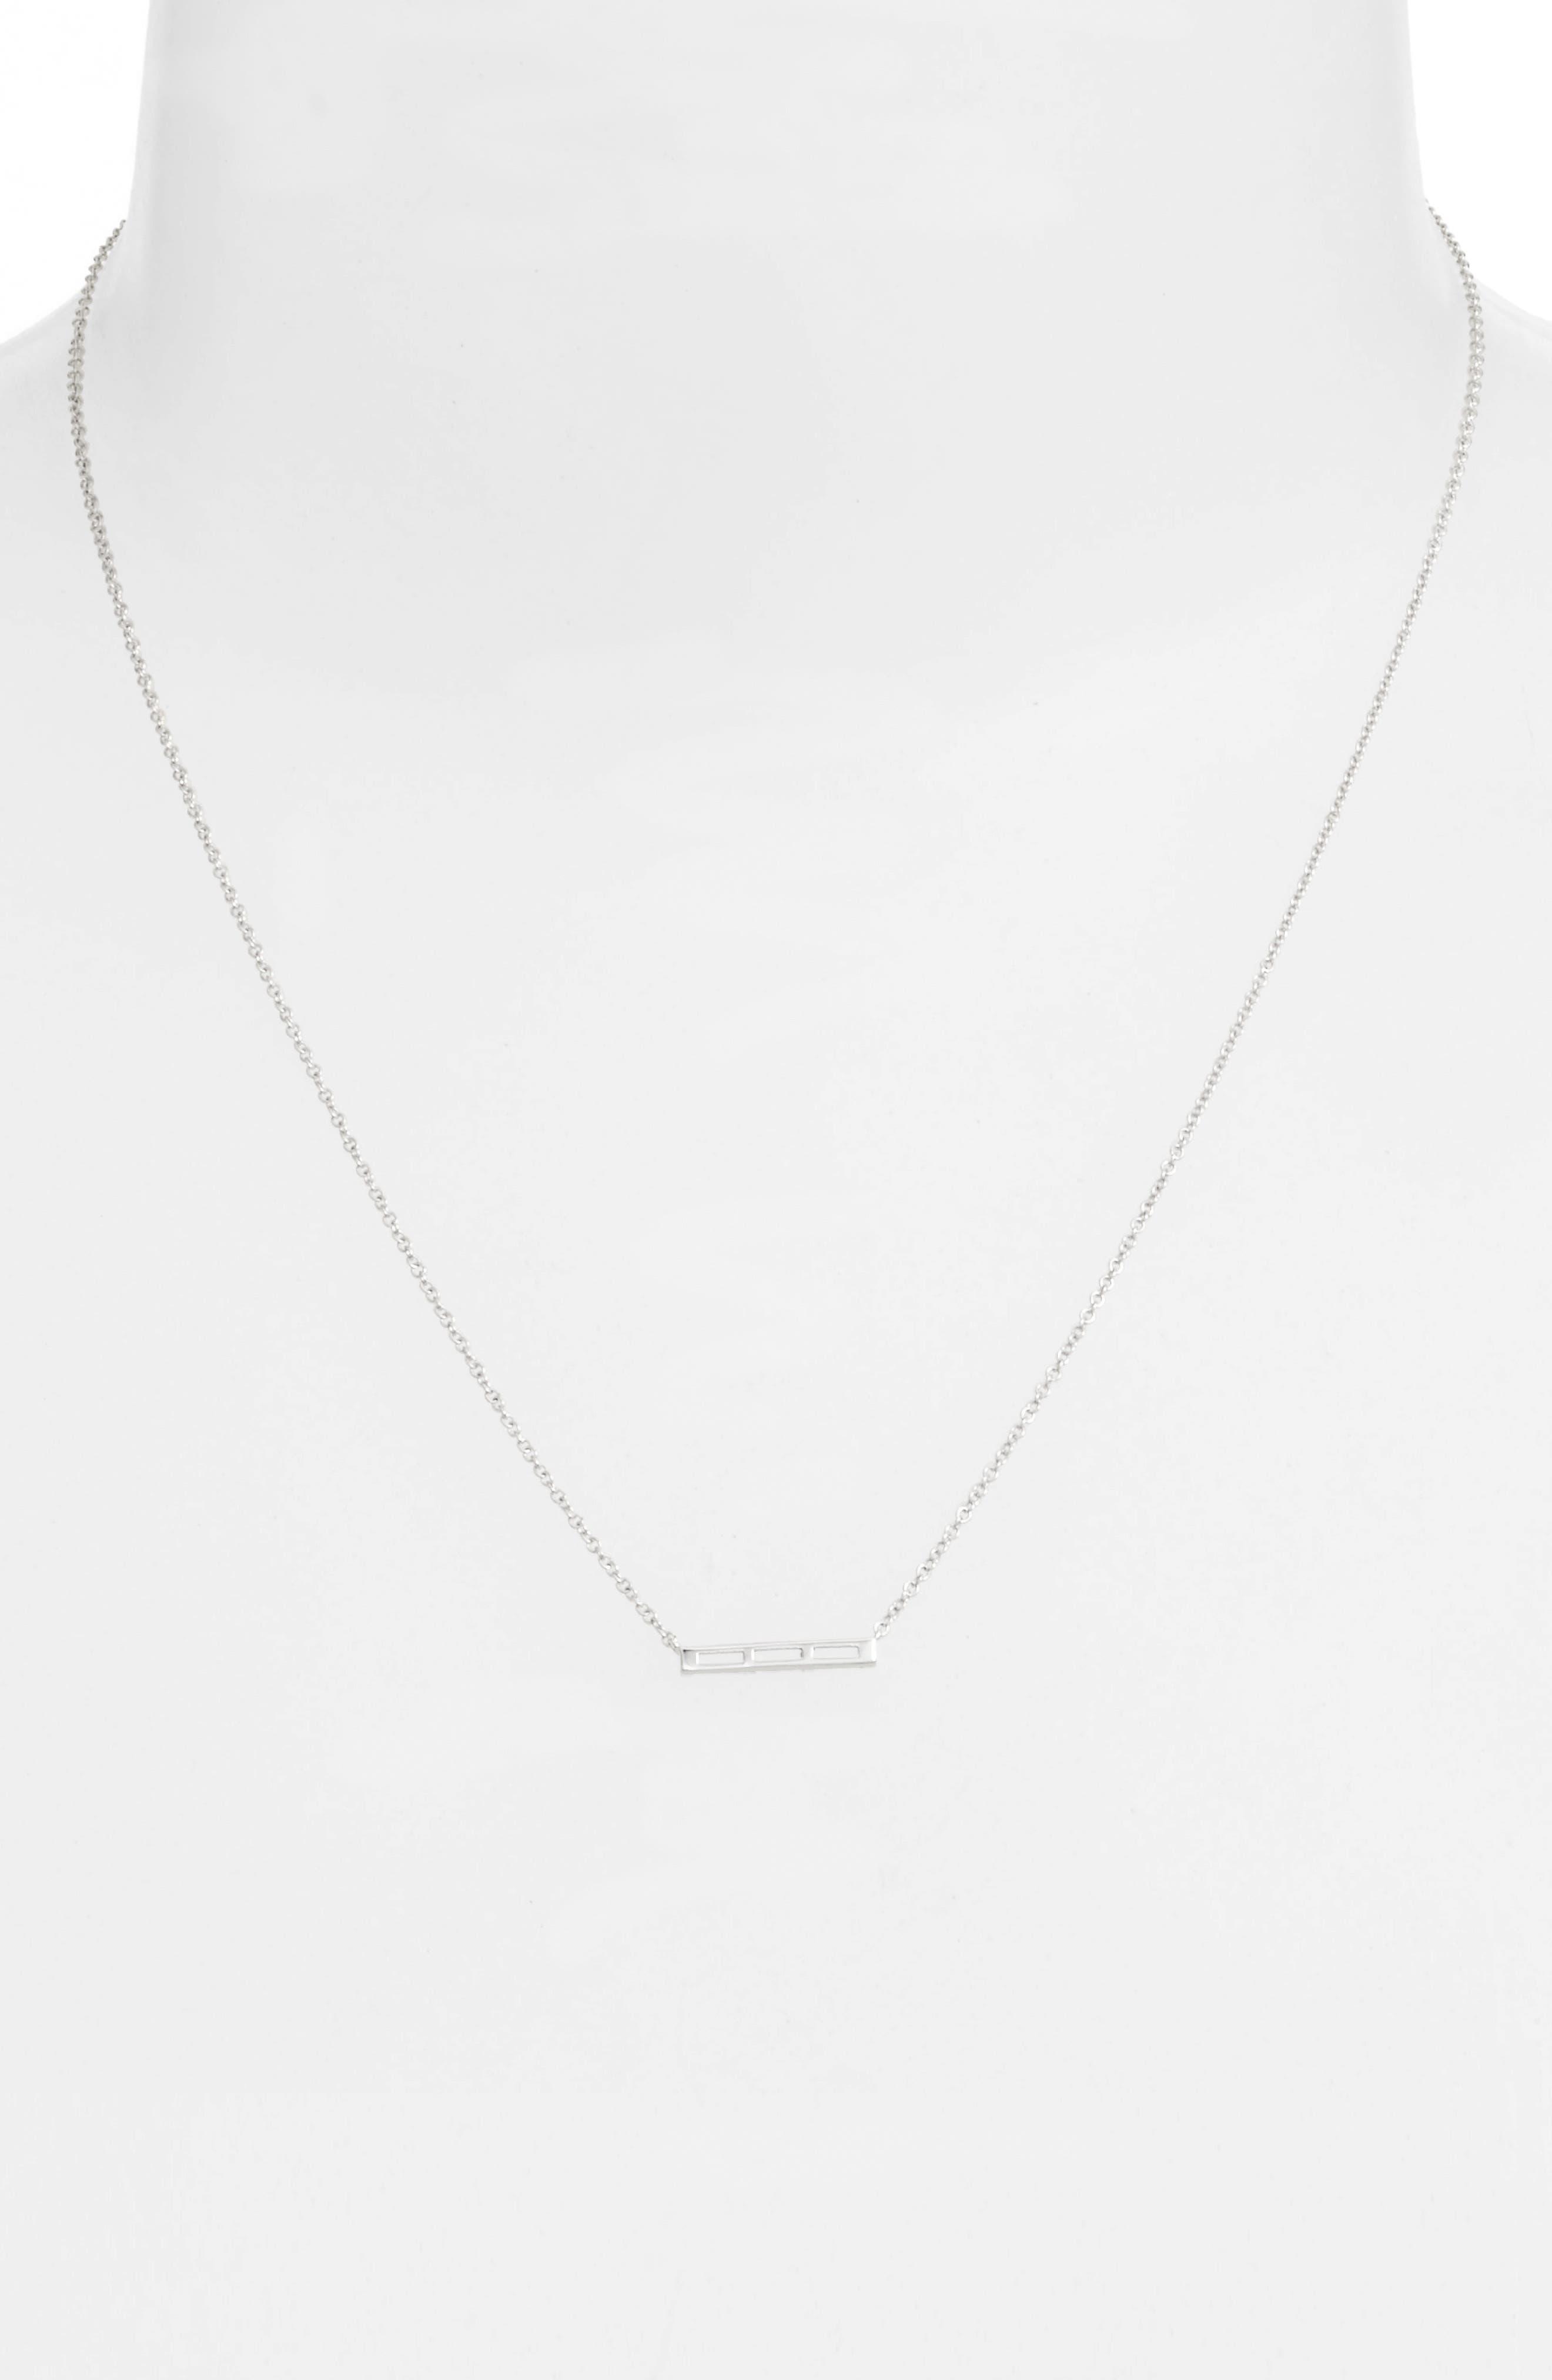 Bar Pendant Necklace,                             Alternate thumbnail 2, color,                             White Gold